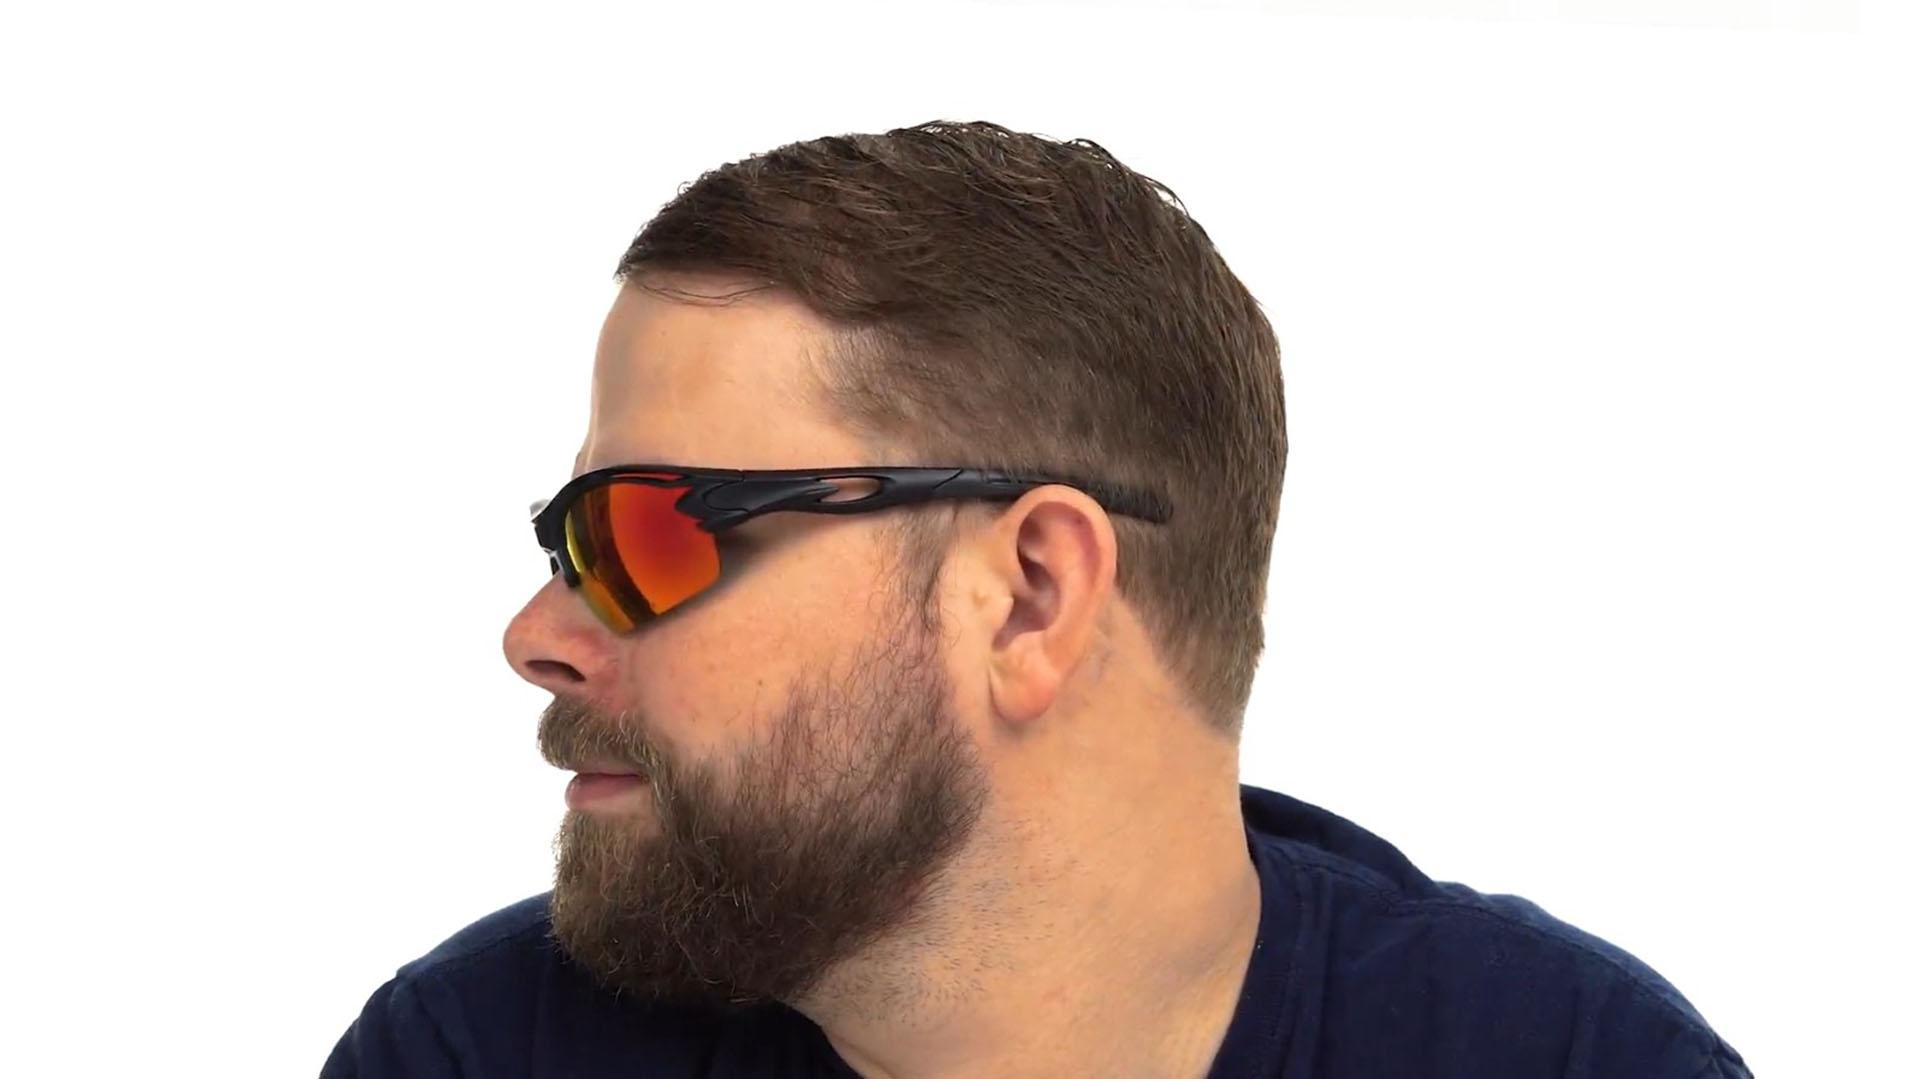 Matrix Bayshore Prescription Safety Sports Sunglasses - Polarized or Transition Lenses